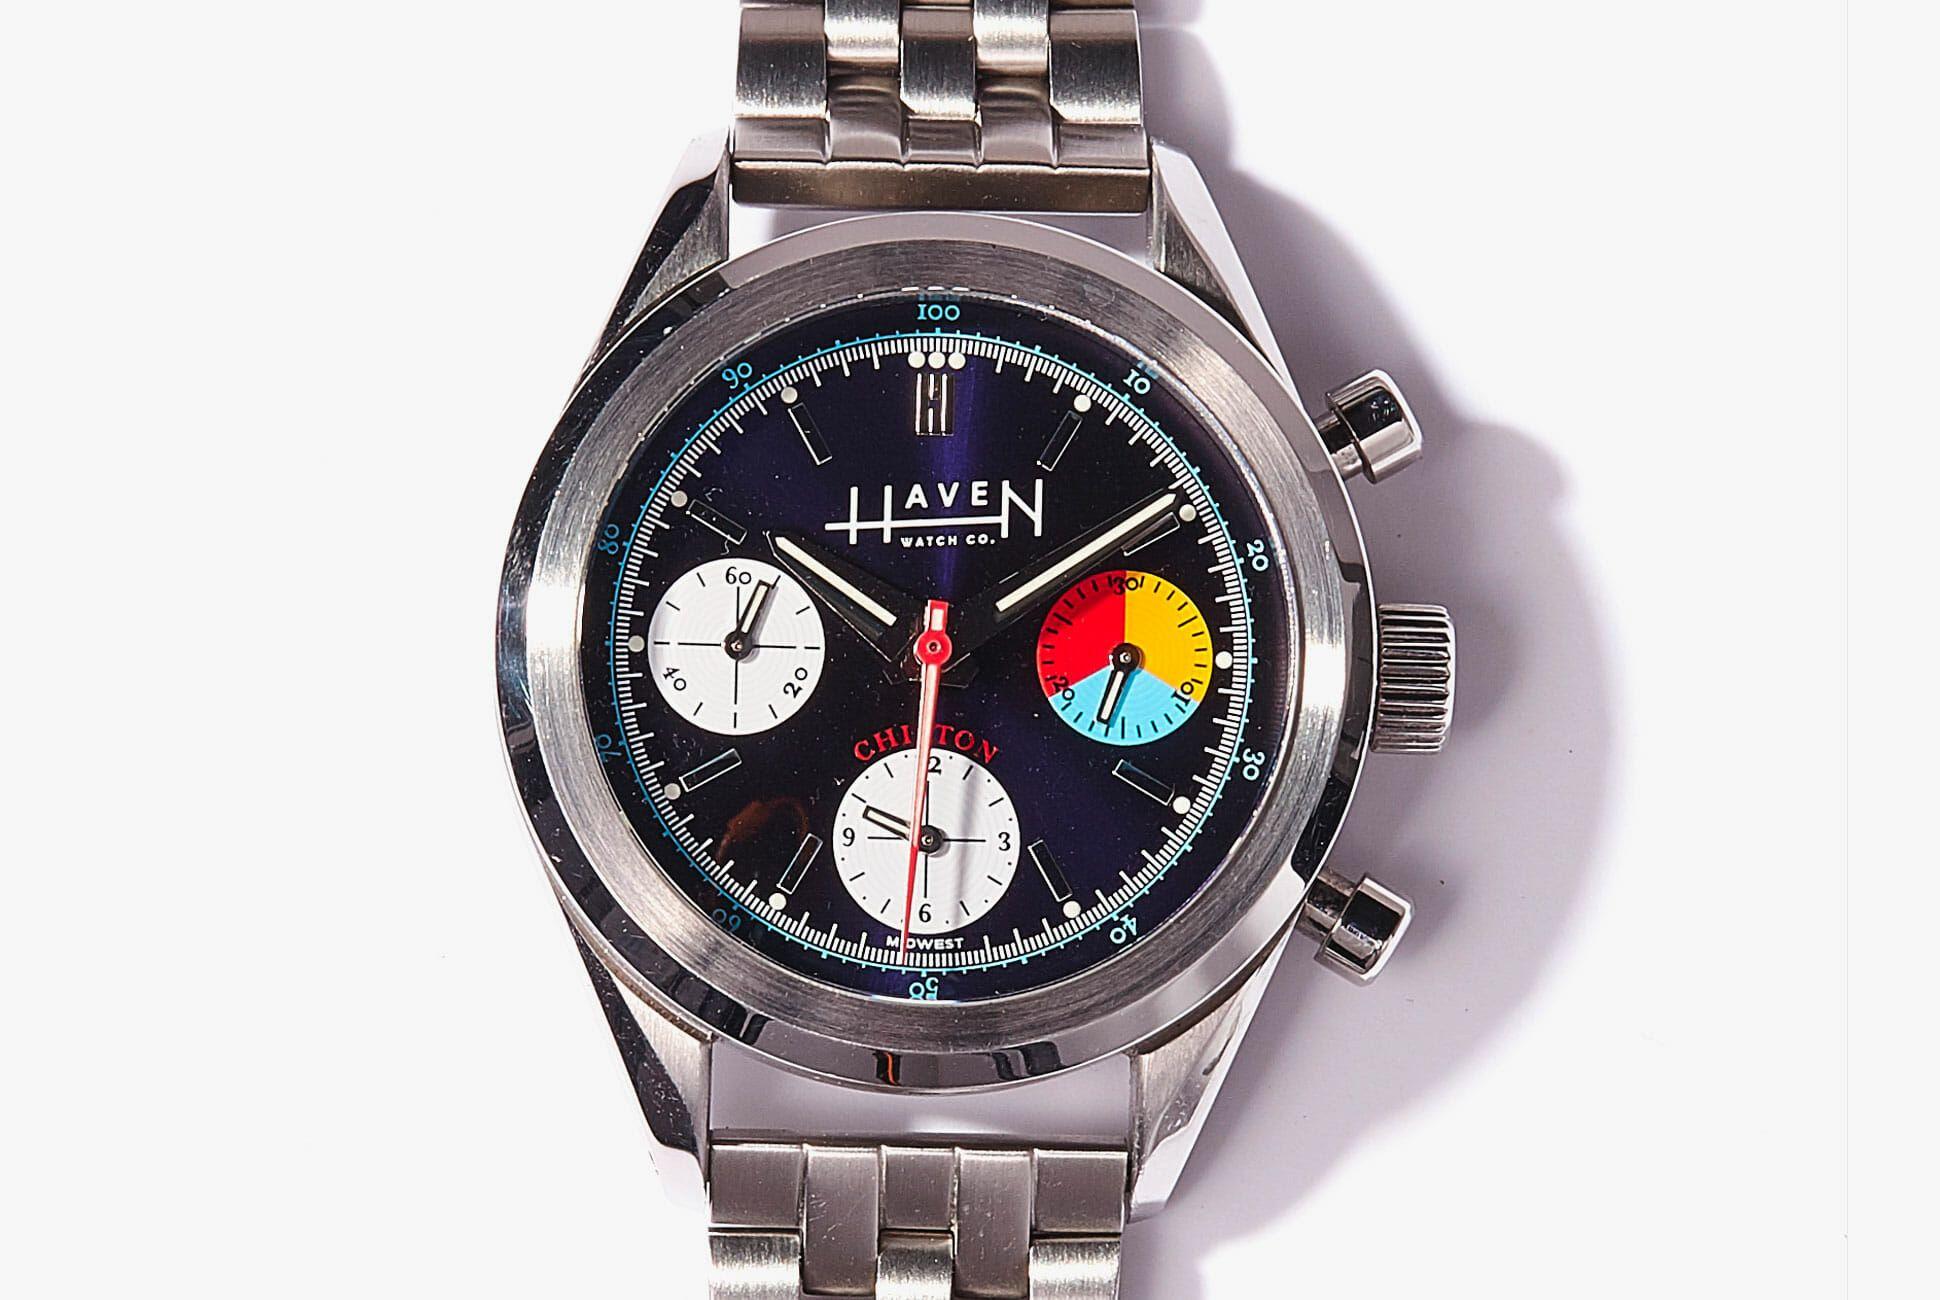 Haven-Watch-Co-Chilton-Chronograph-gear-patrol-slide-4